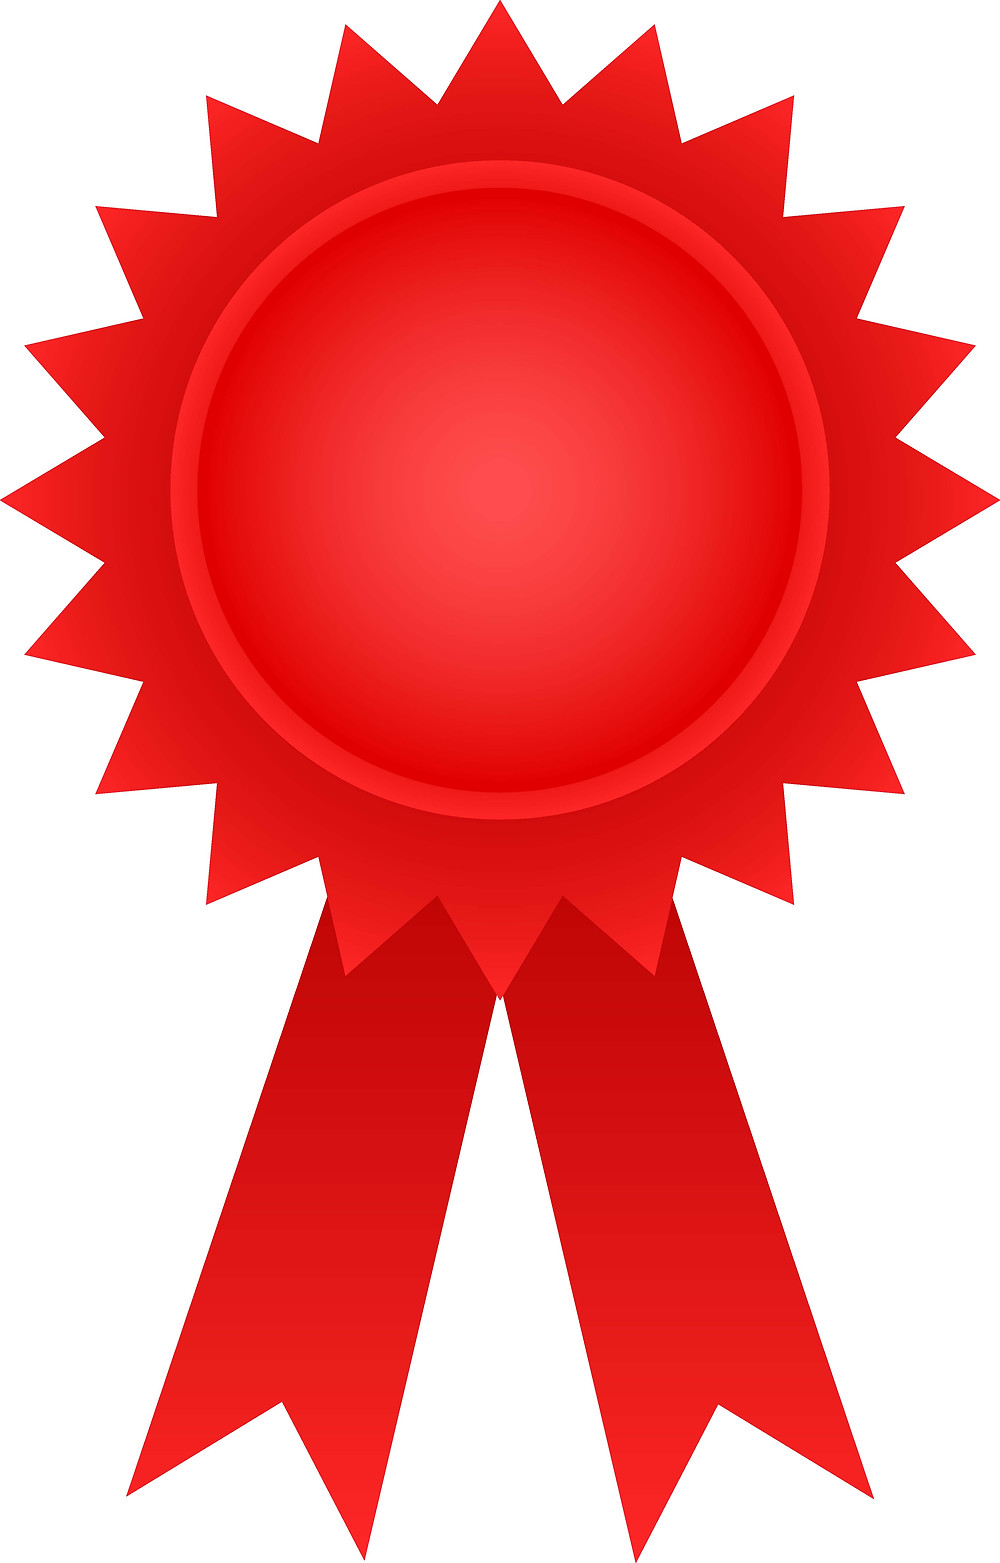 award_ribbon_red copy.jpg